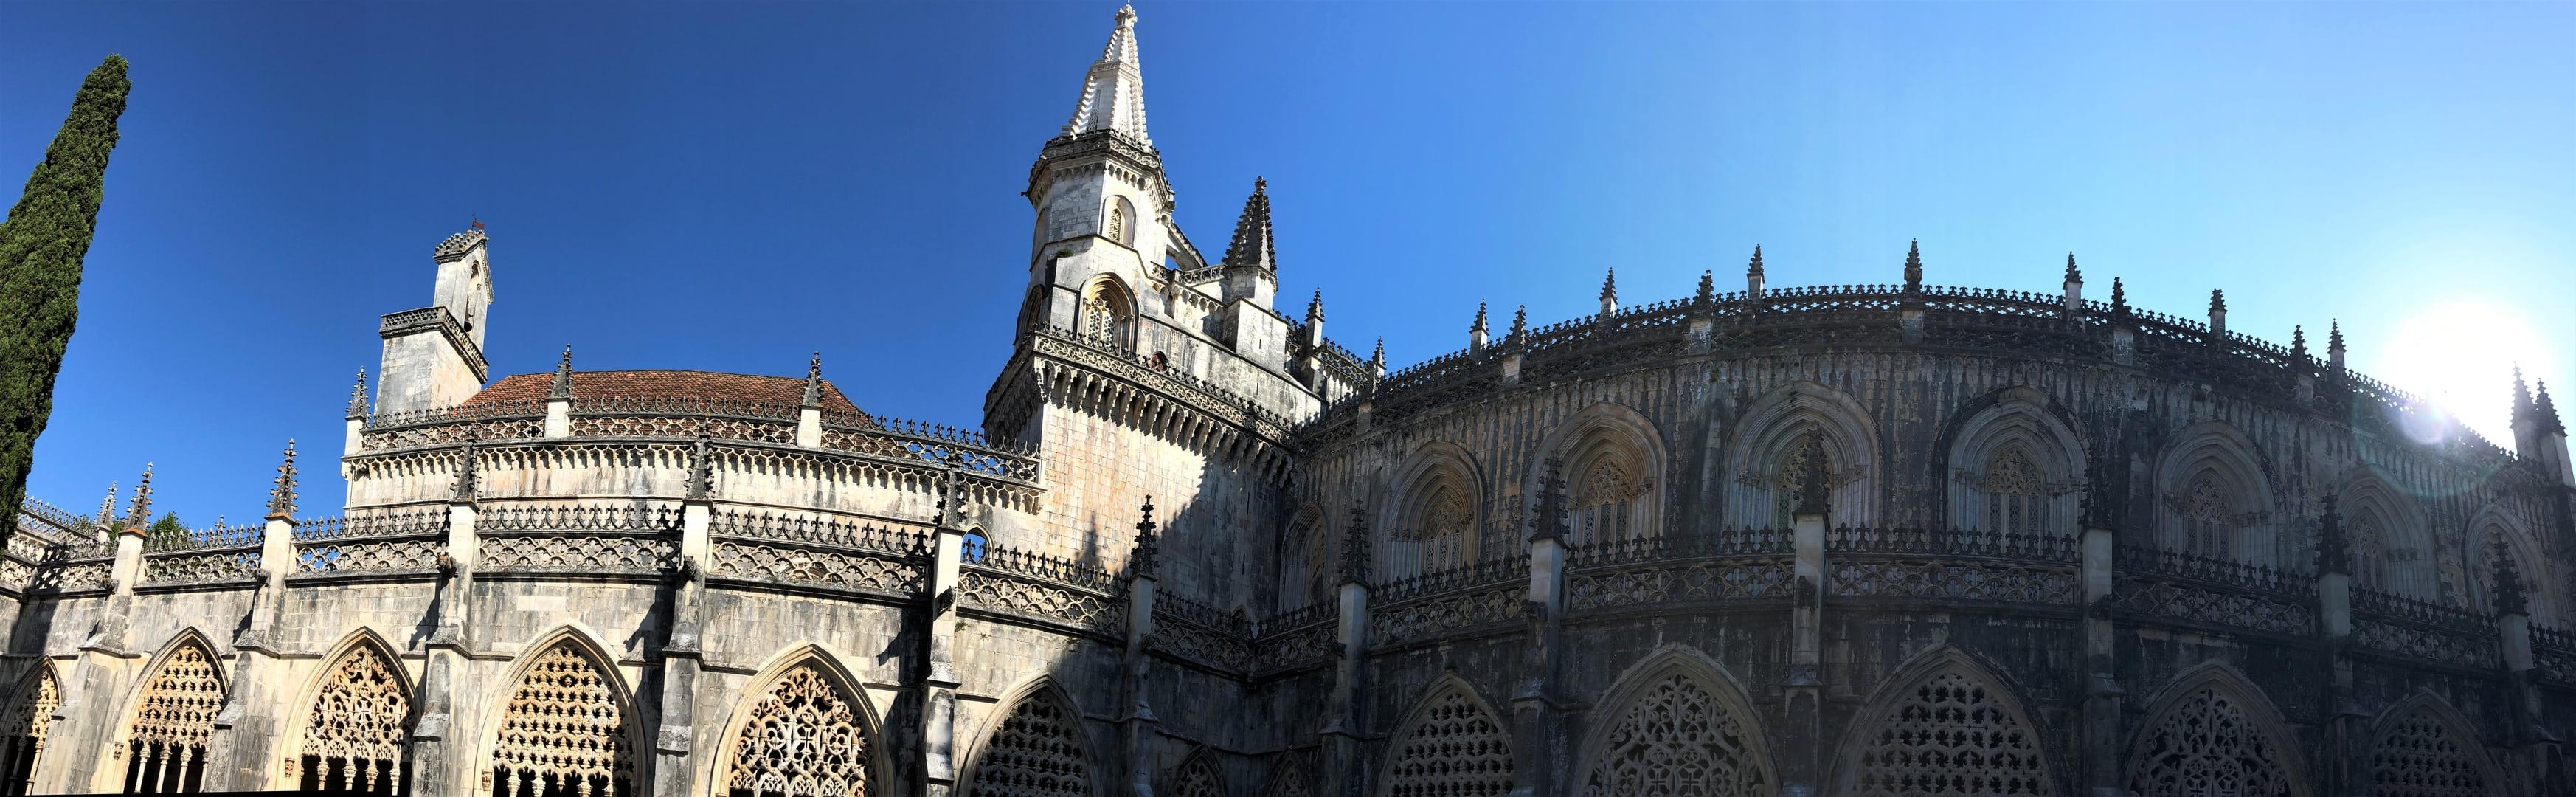 Batalha Monastery (Portugal)